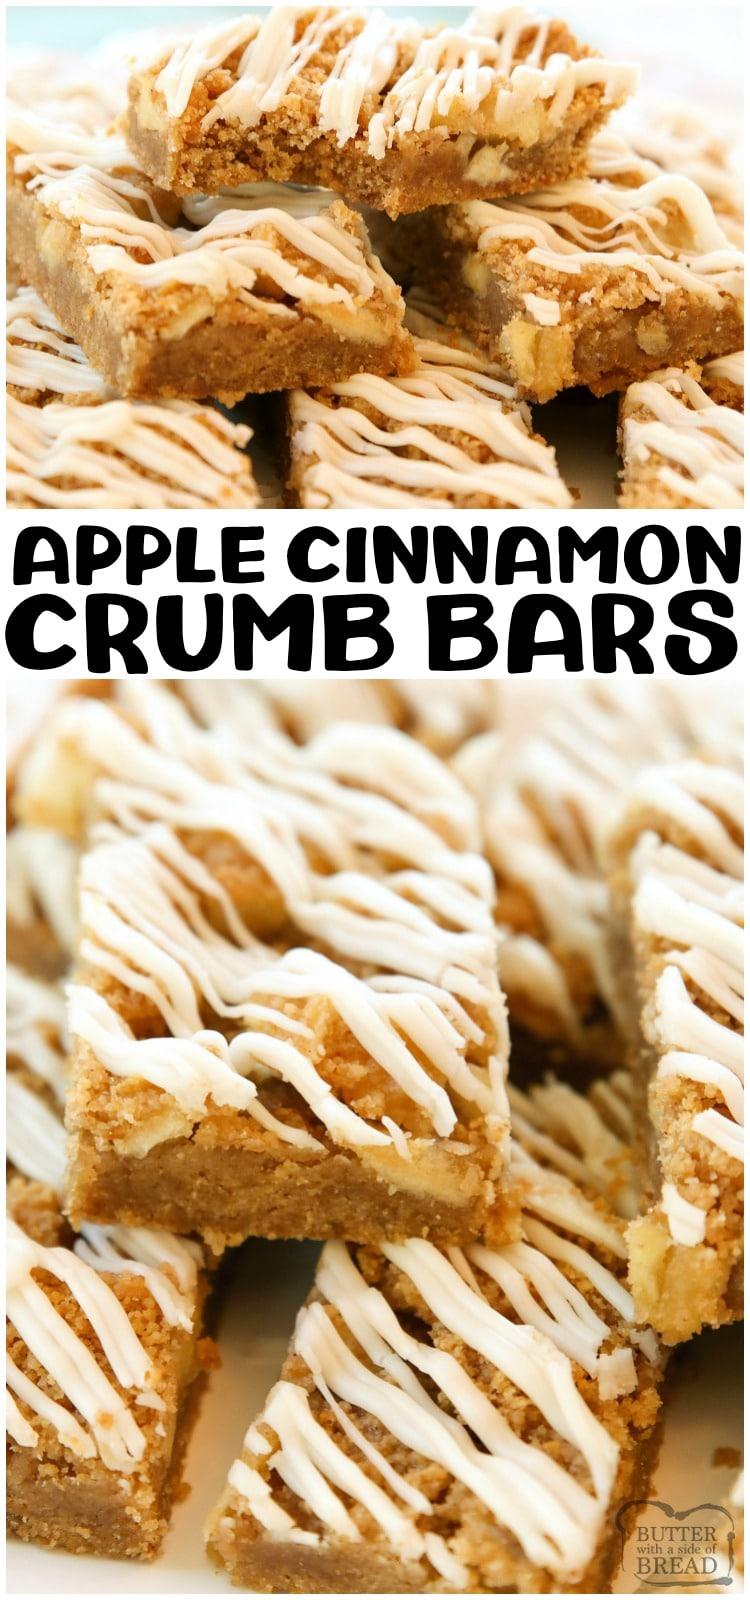 Apple Cinnamon Crumb Bars made with fresh apple, brown sugar, graham crackers & cinnamon! Simple baked apple bars recipe topped with a vanilla glaze.